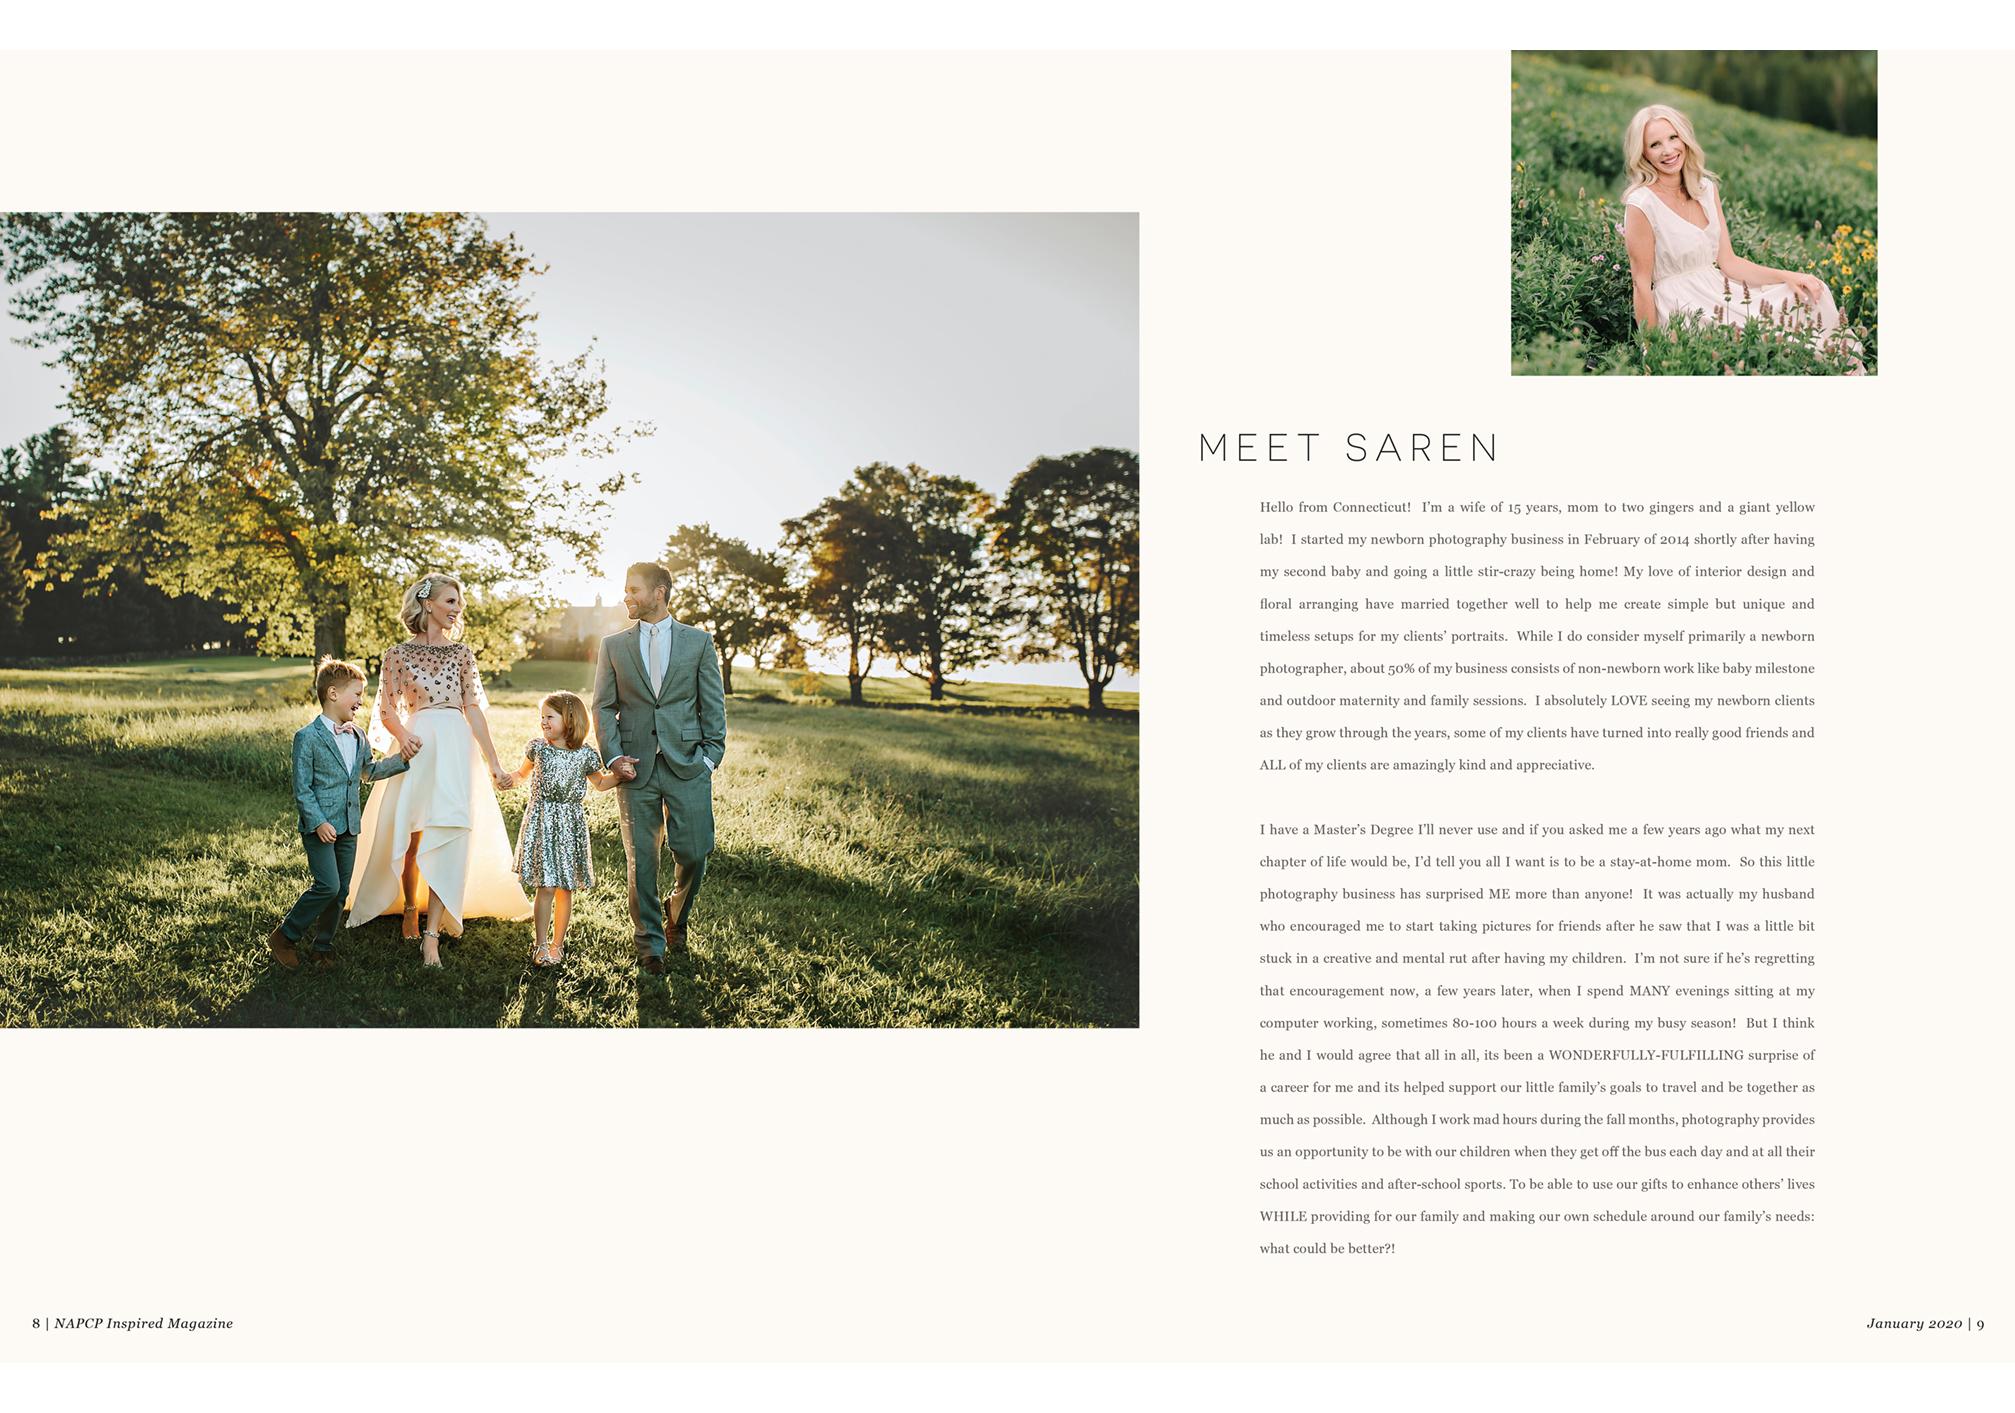 January 2020 Inspired Magazine, Meet Saren